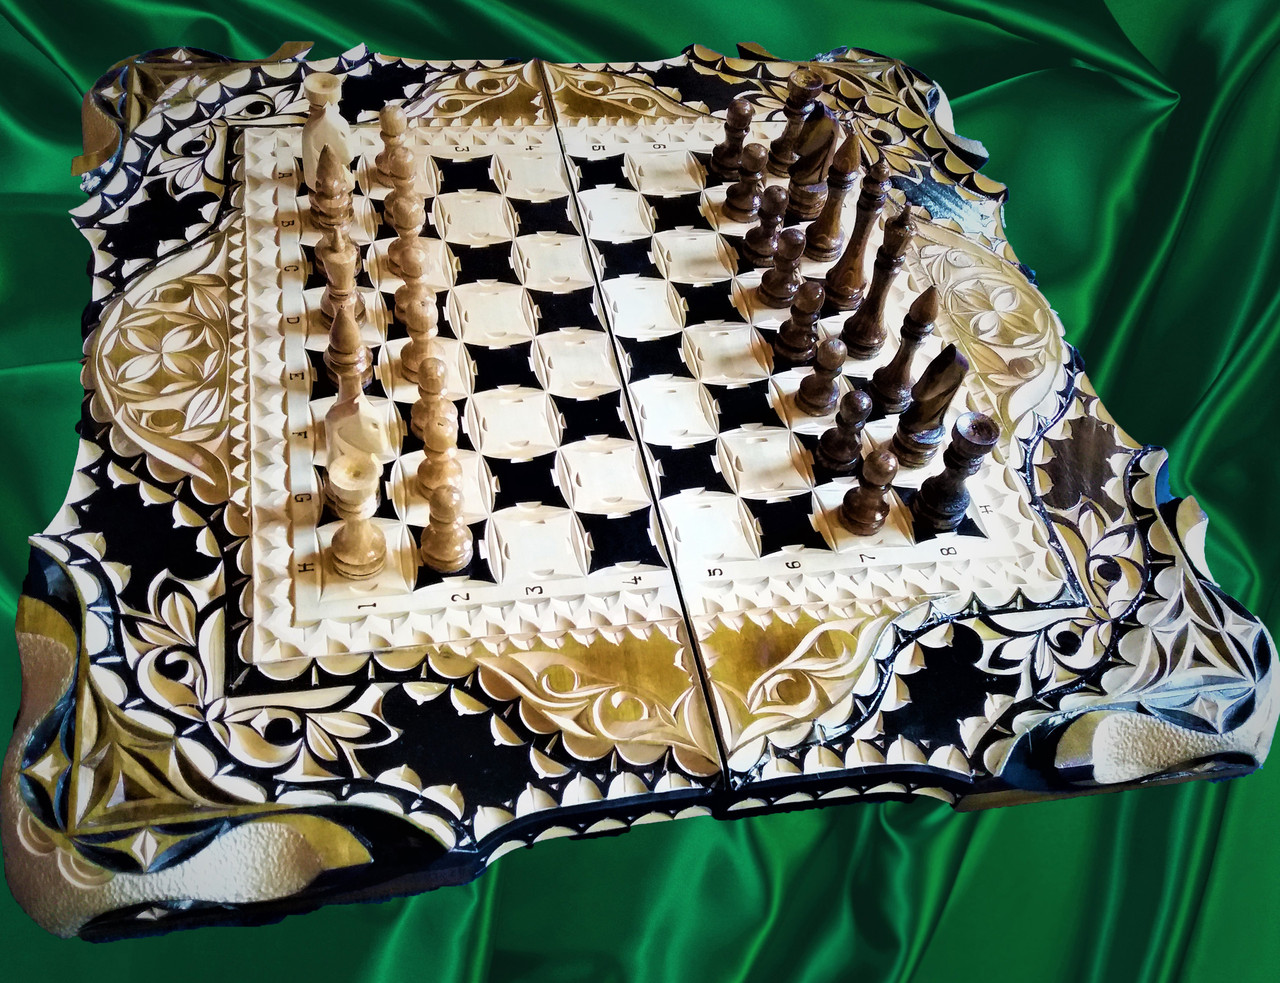 Шахматы-нарды в резьбе подарочные